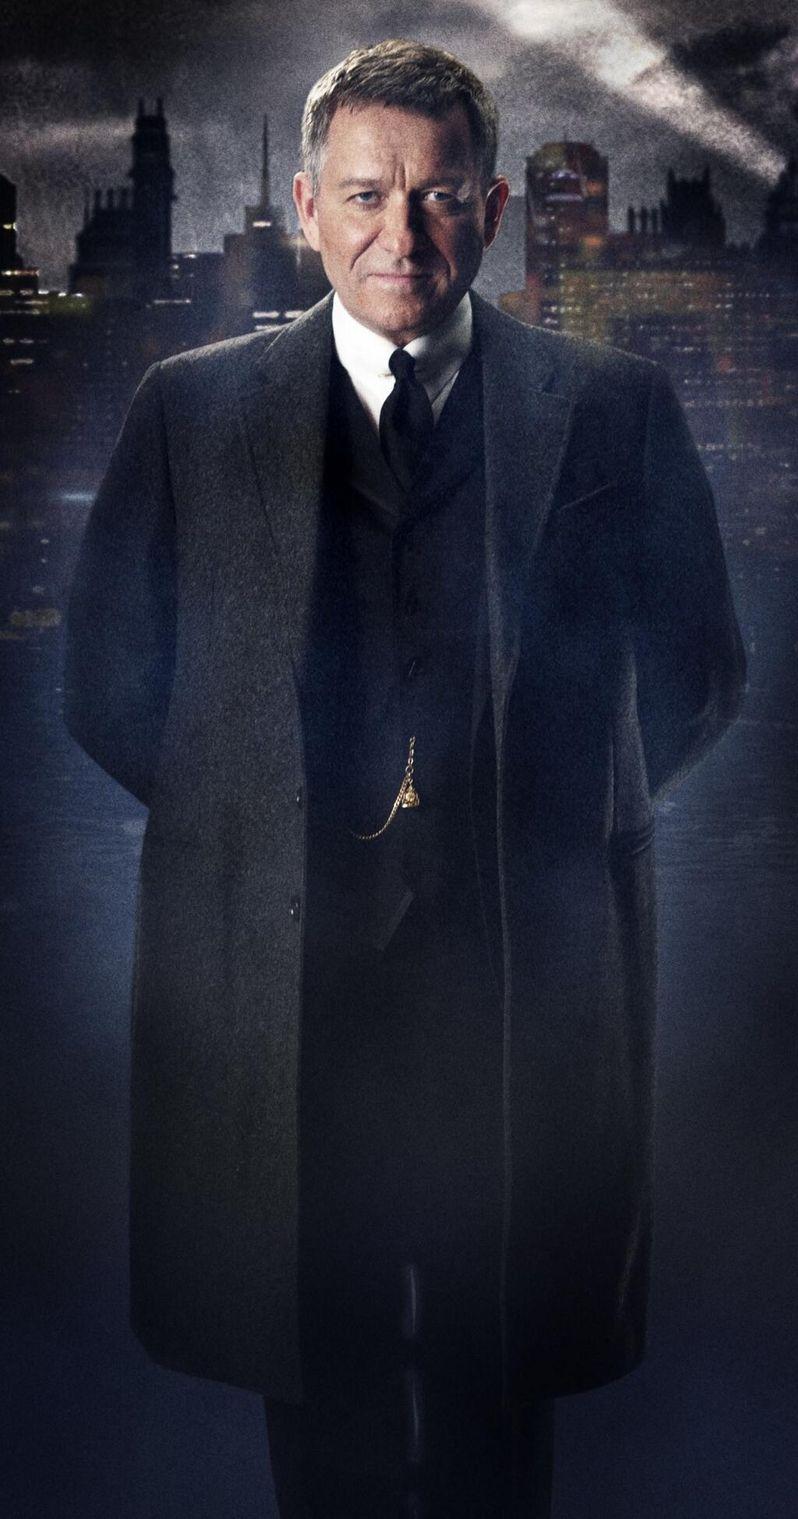 <strong><em>Gotham</em></strong> Alfred Pennyworth Photo